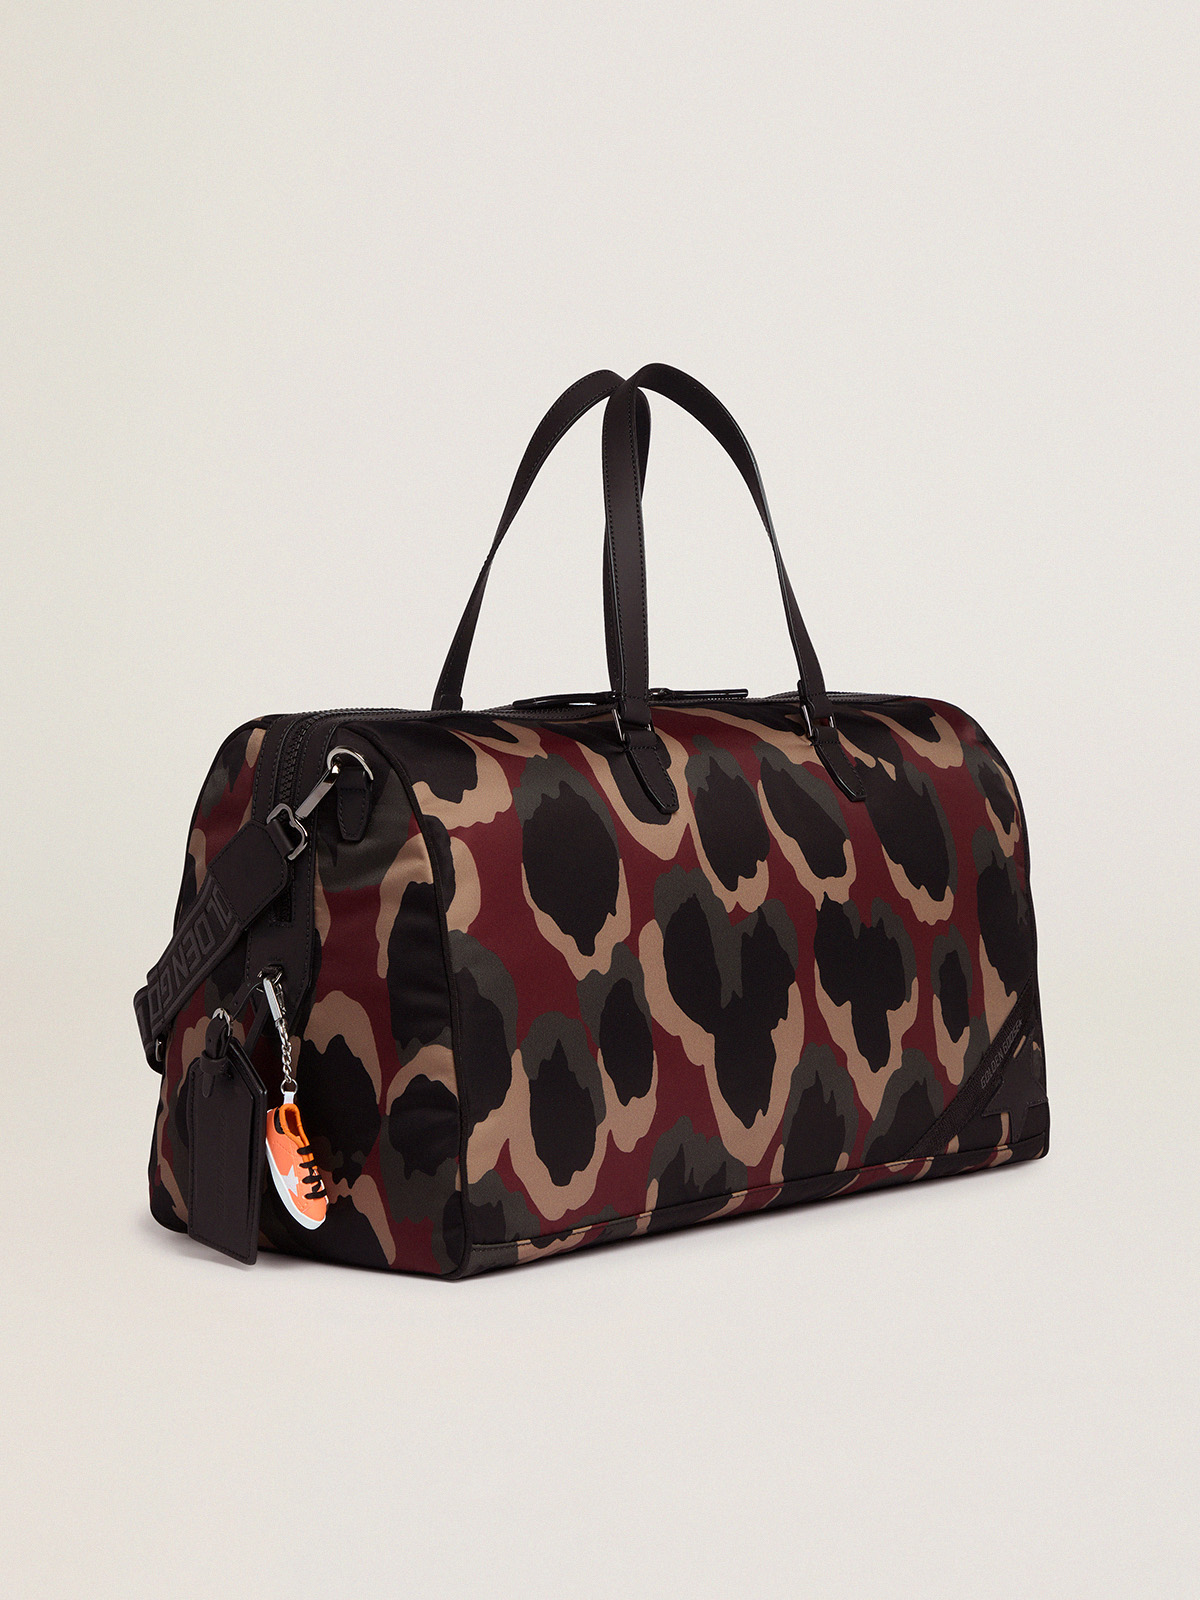 Golden Goose - Journey Duffle Bag in camouflage nylon in